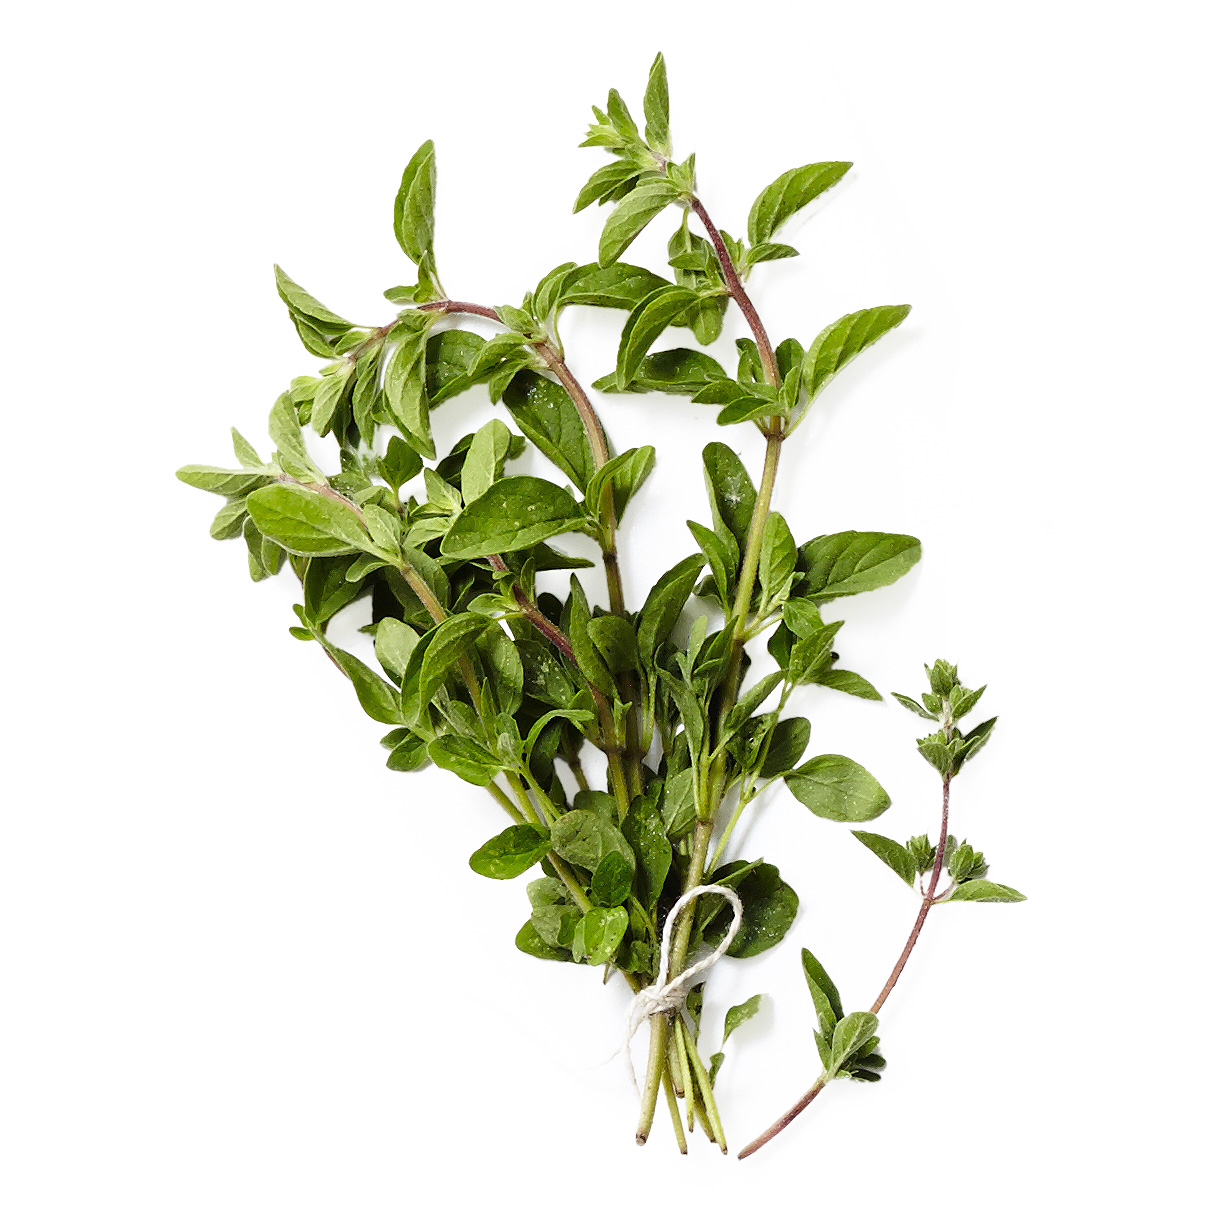 marjoram herb plant